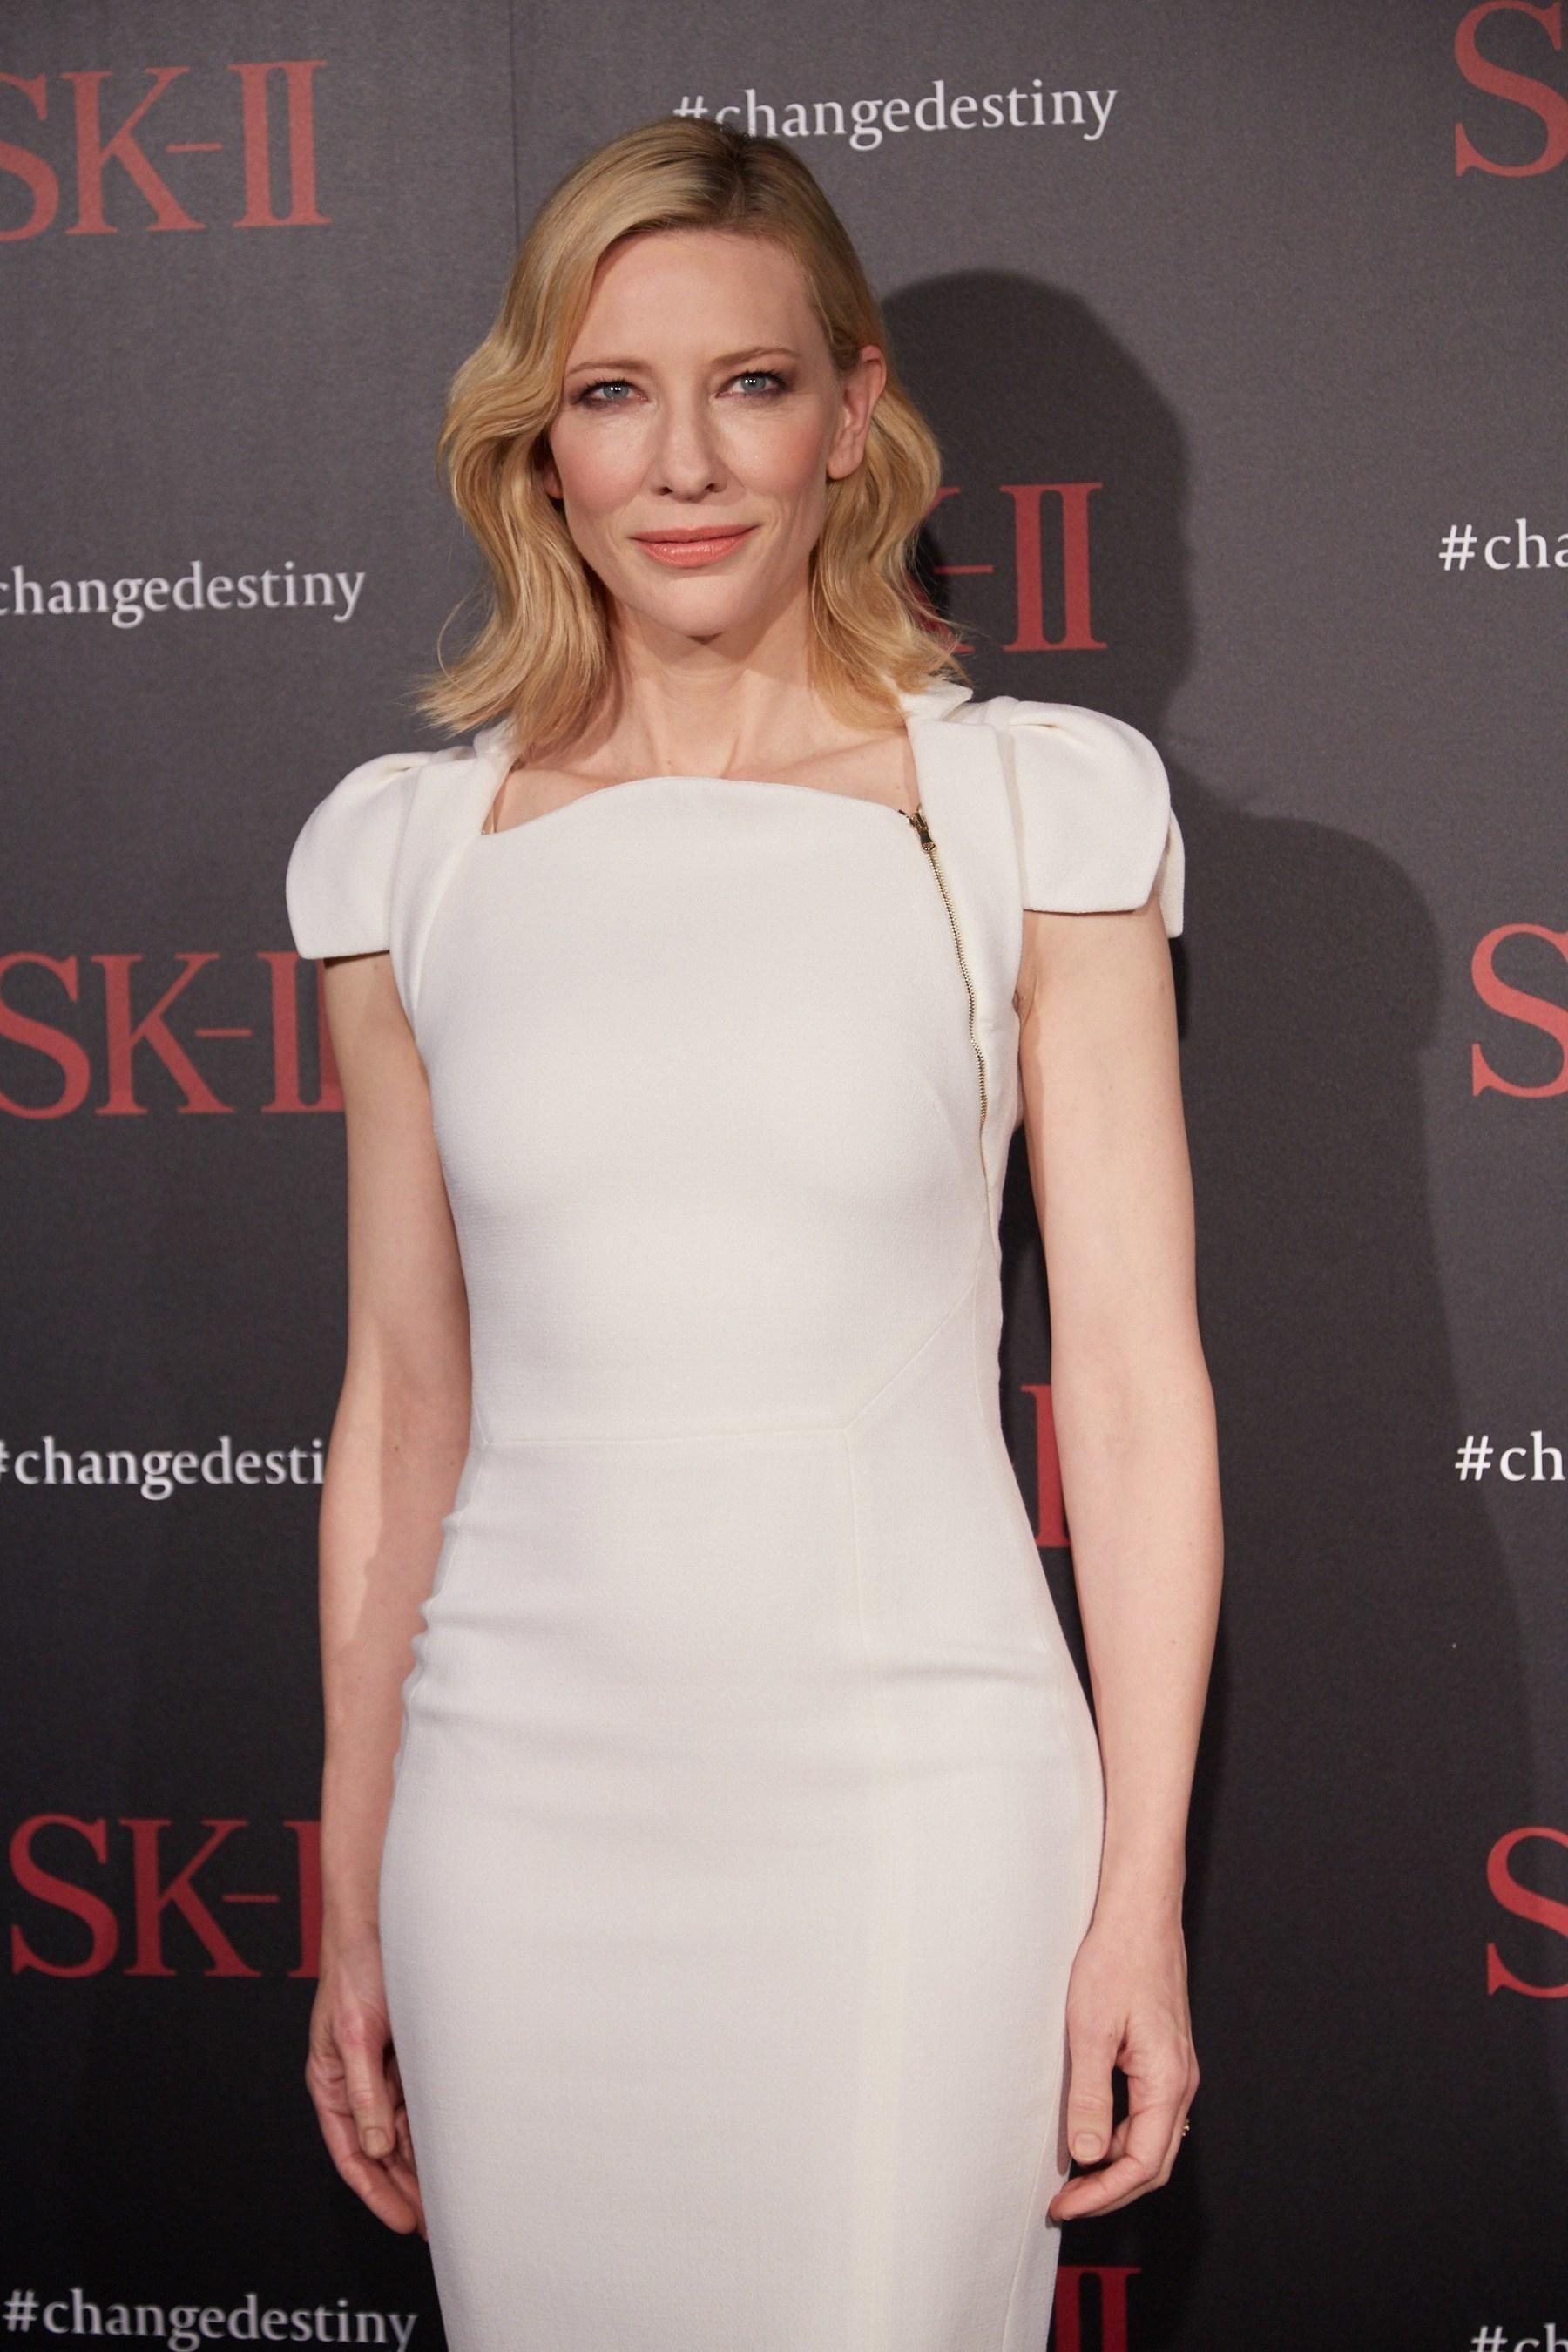 SK-II Global Brand Ambassador Cate Blanchett attends the SK-II #changedestiny Forum in L.A.